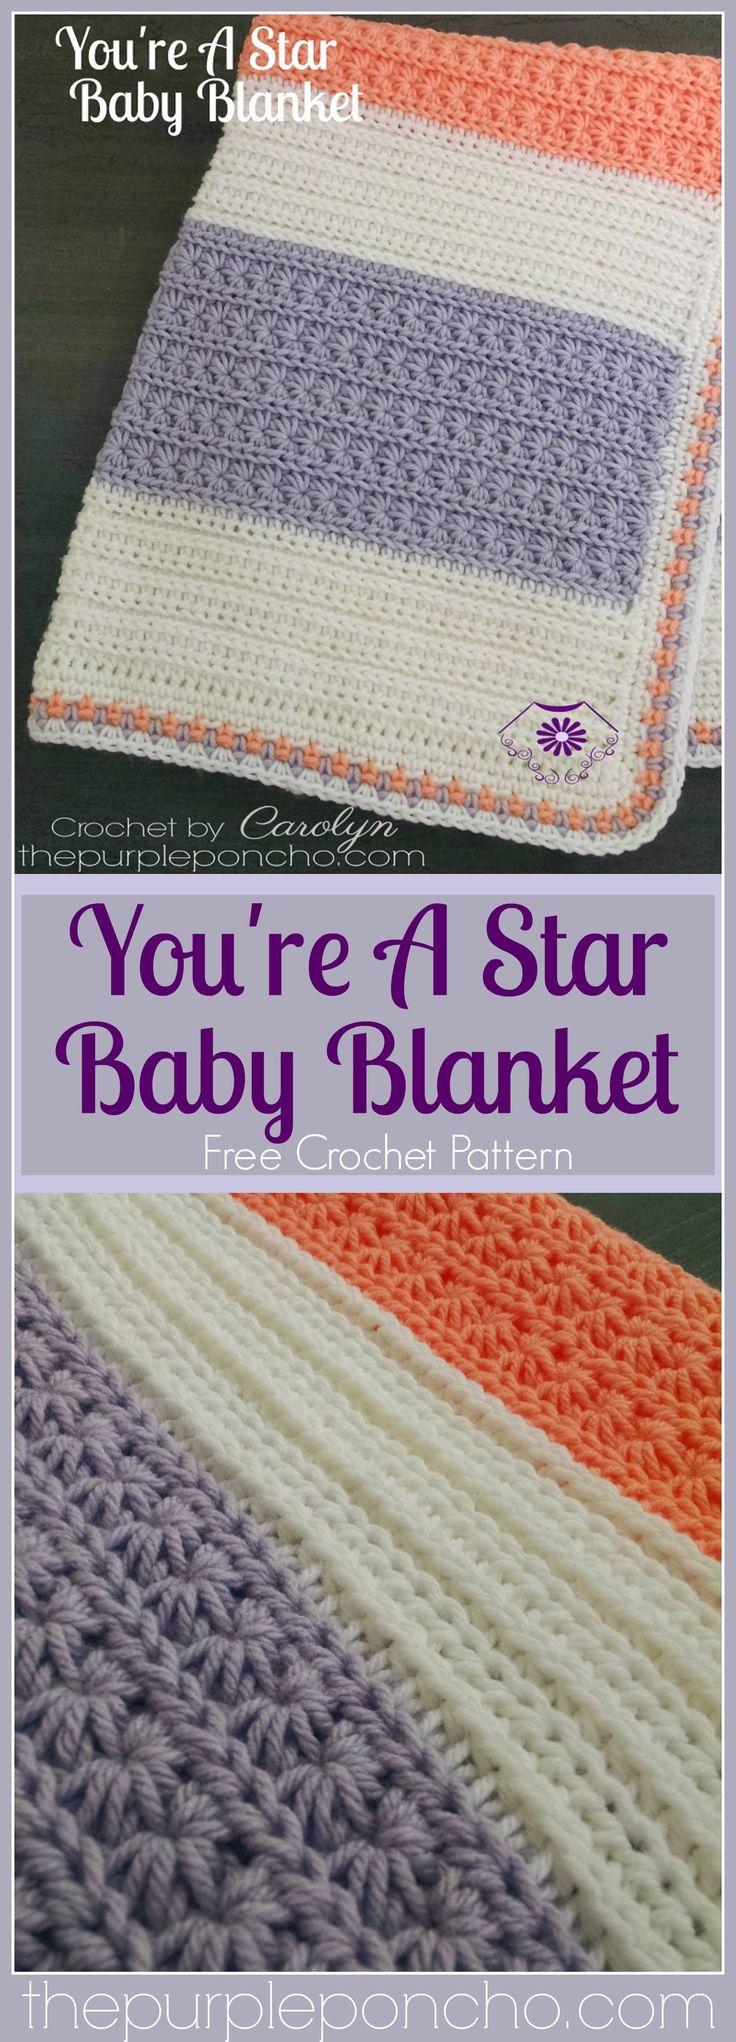 25993 best crochet images on pinterest crochet crochet doilies youre a star baby blanket free crochet pattern the purple poncho bankloansurffo Images